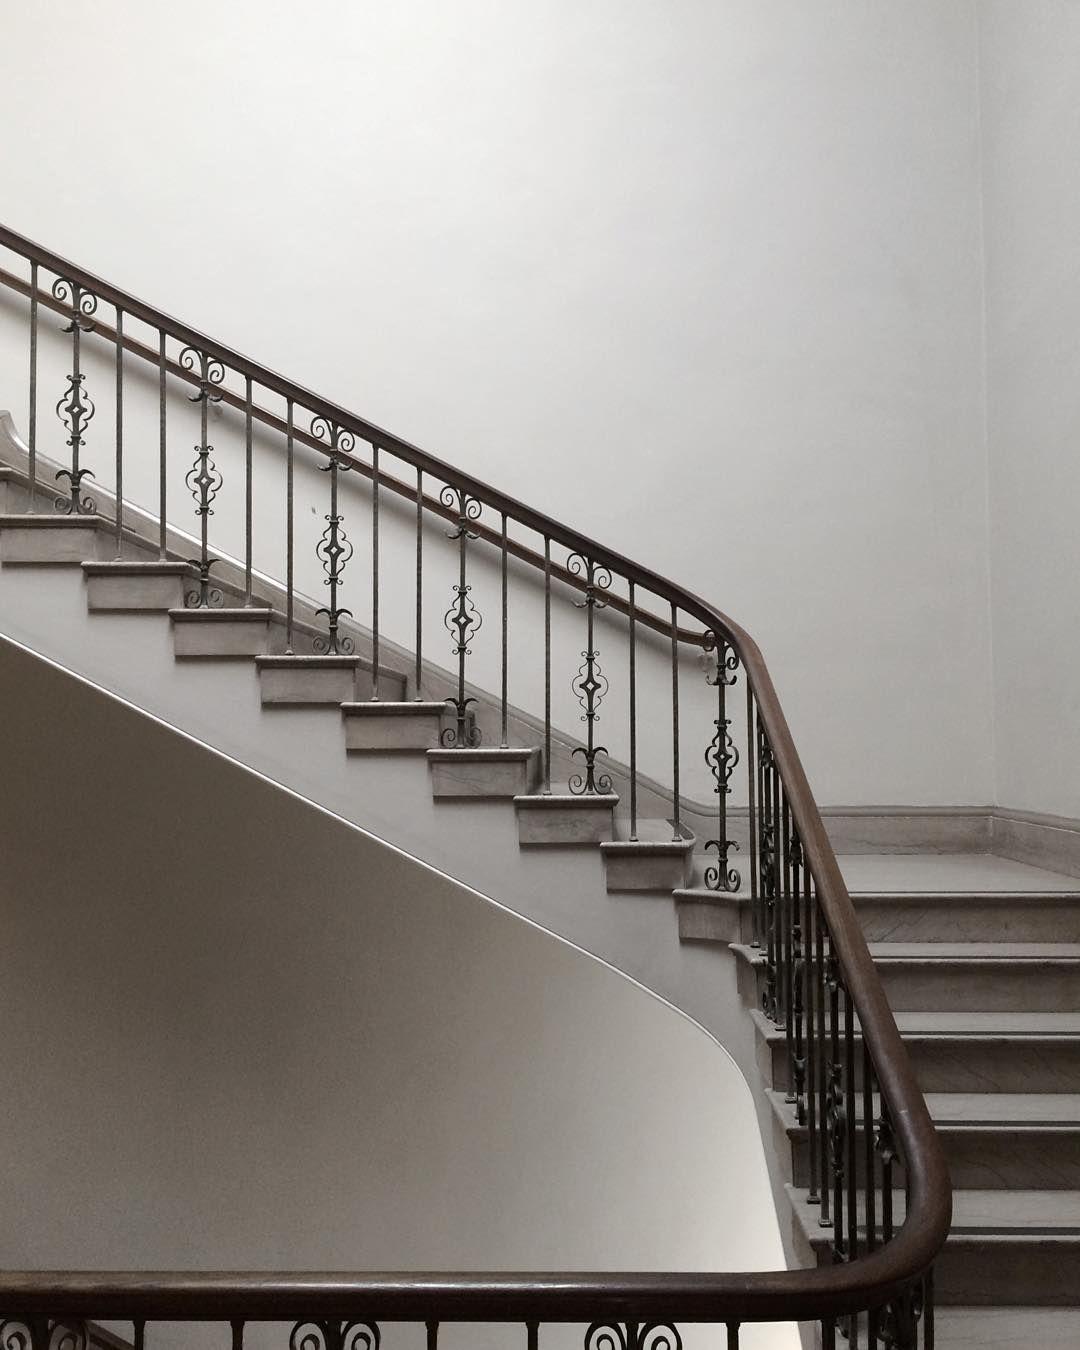 Home Decoration Design Minimalist Interior Design Staircase: Minimalist Goods Delivered To You Quarterly @ Minimalism